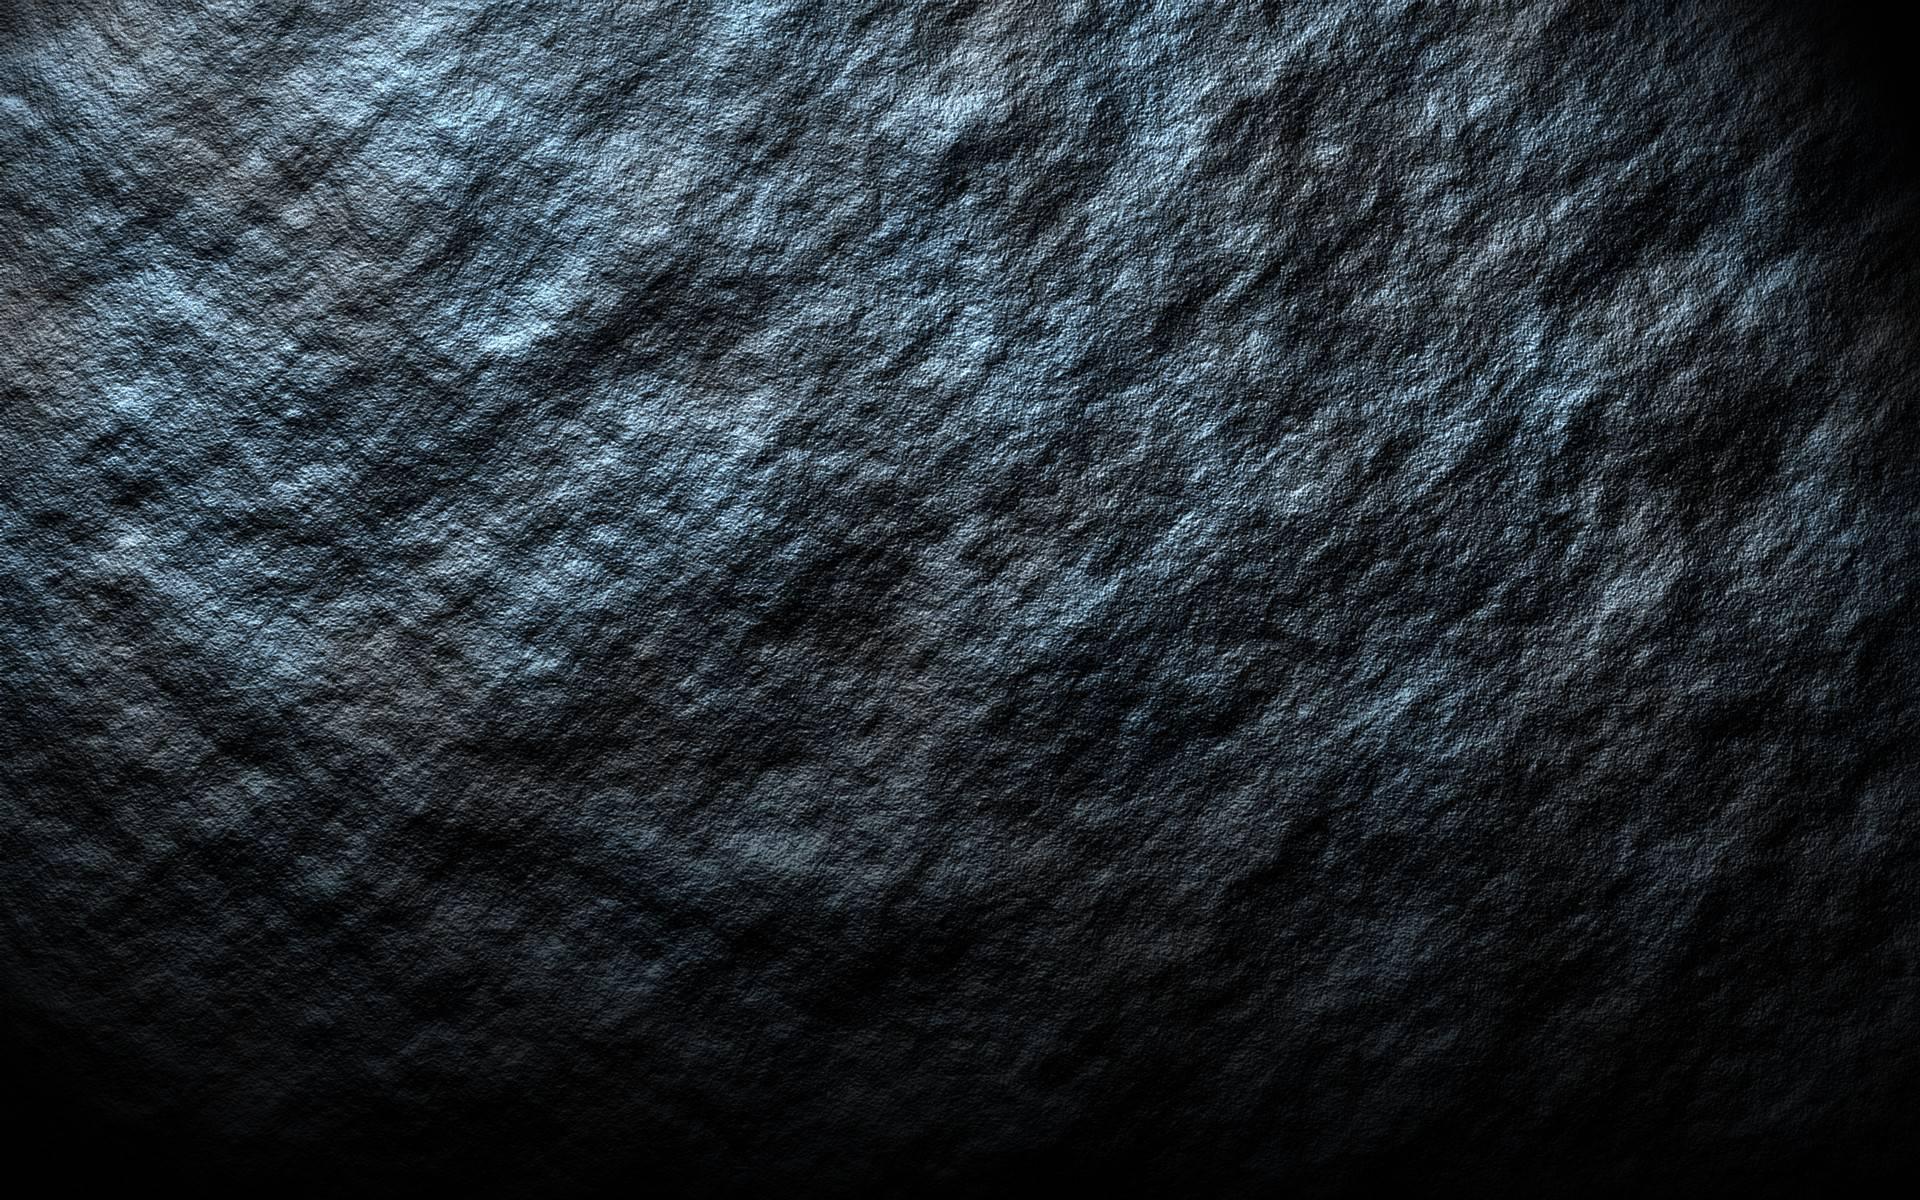 hd wallpapers black stones - photo #21